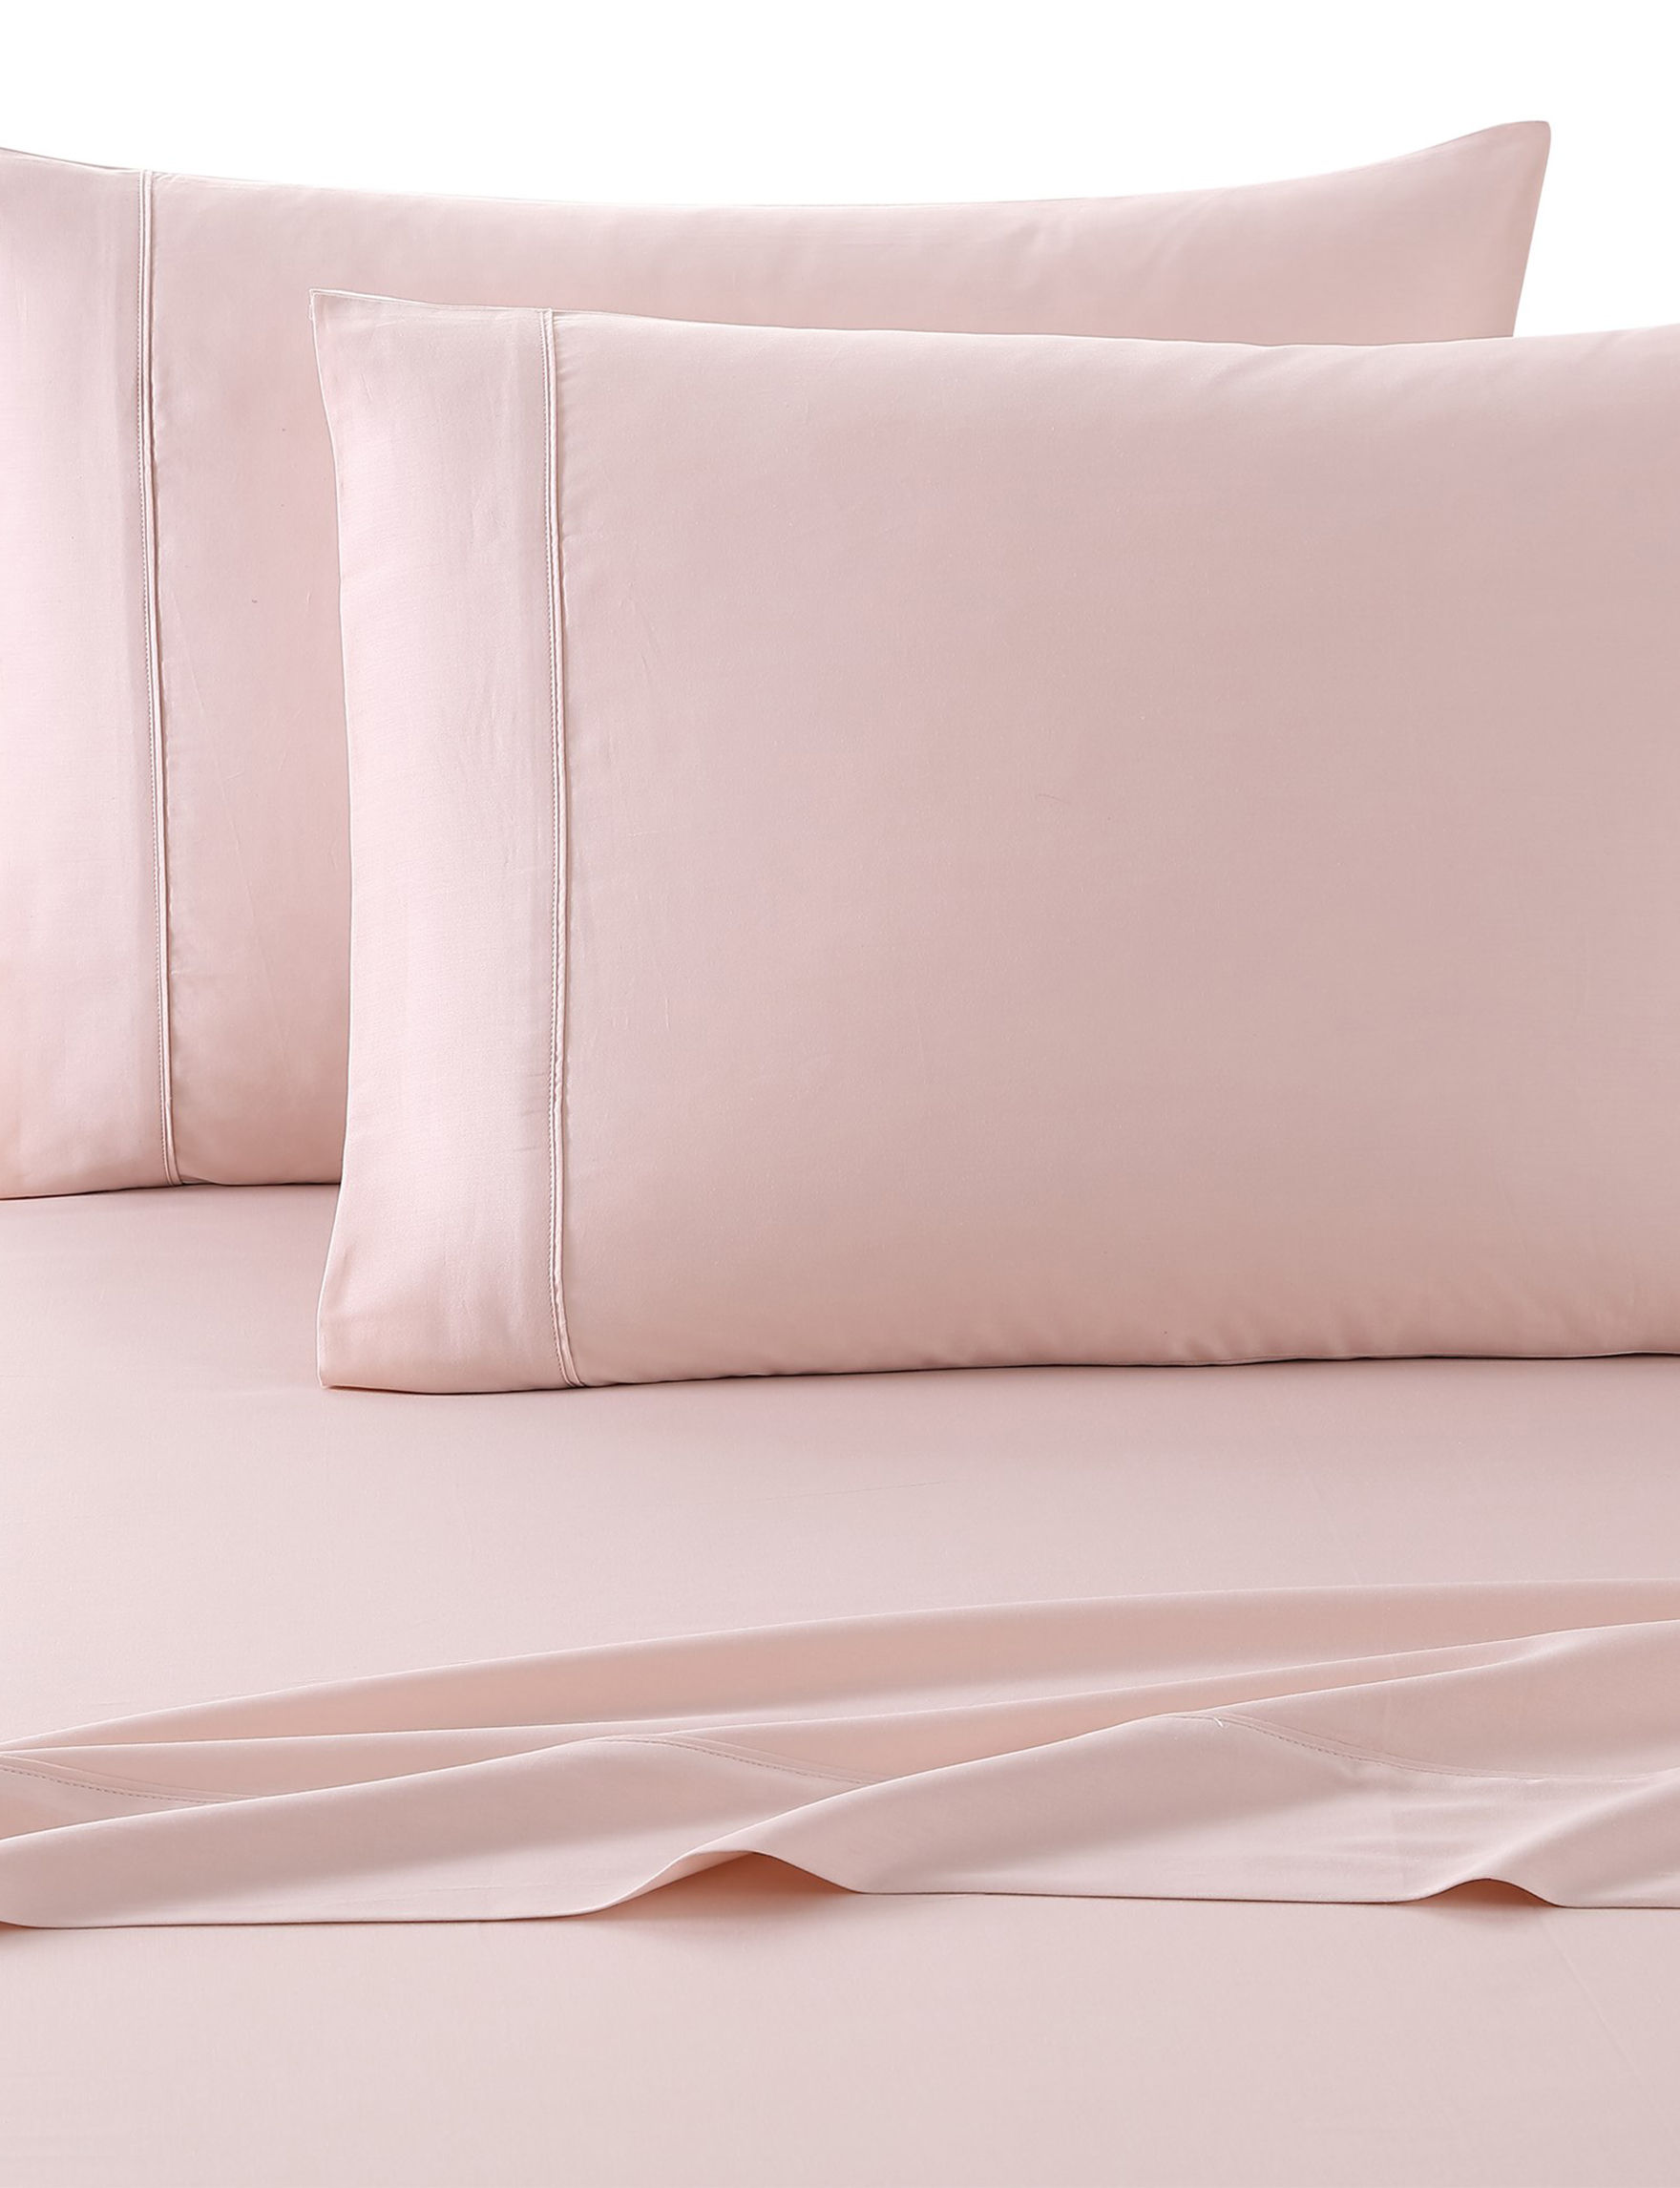 Nikki Chu Rose Gold Sheets & Pillowcases